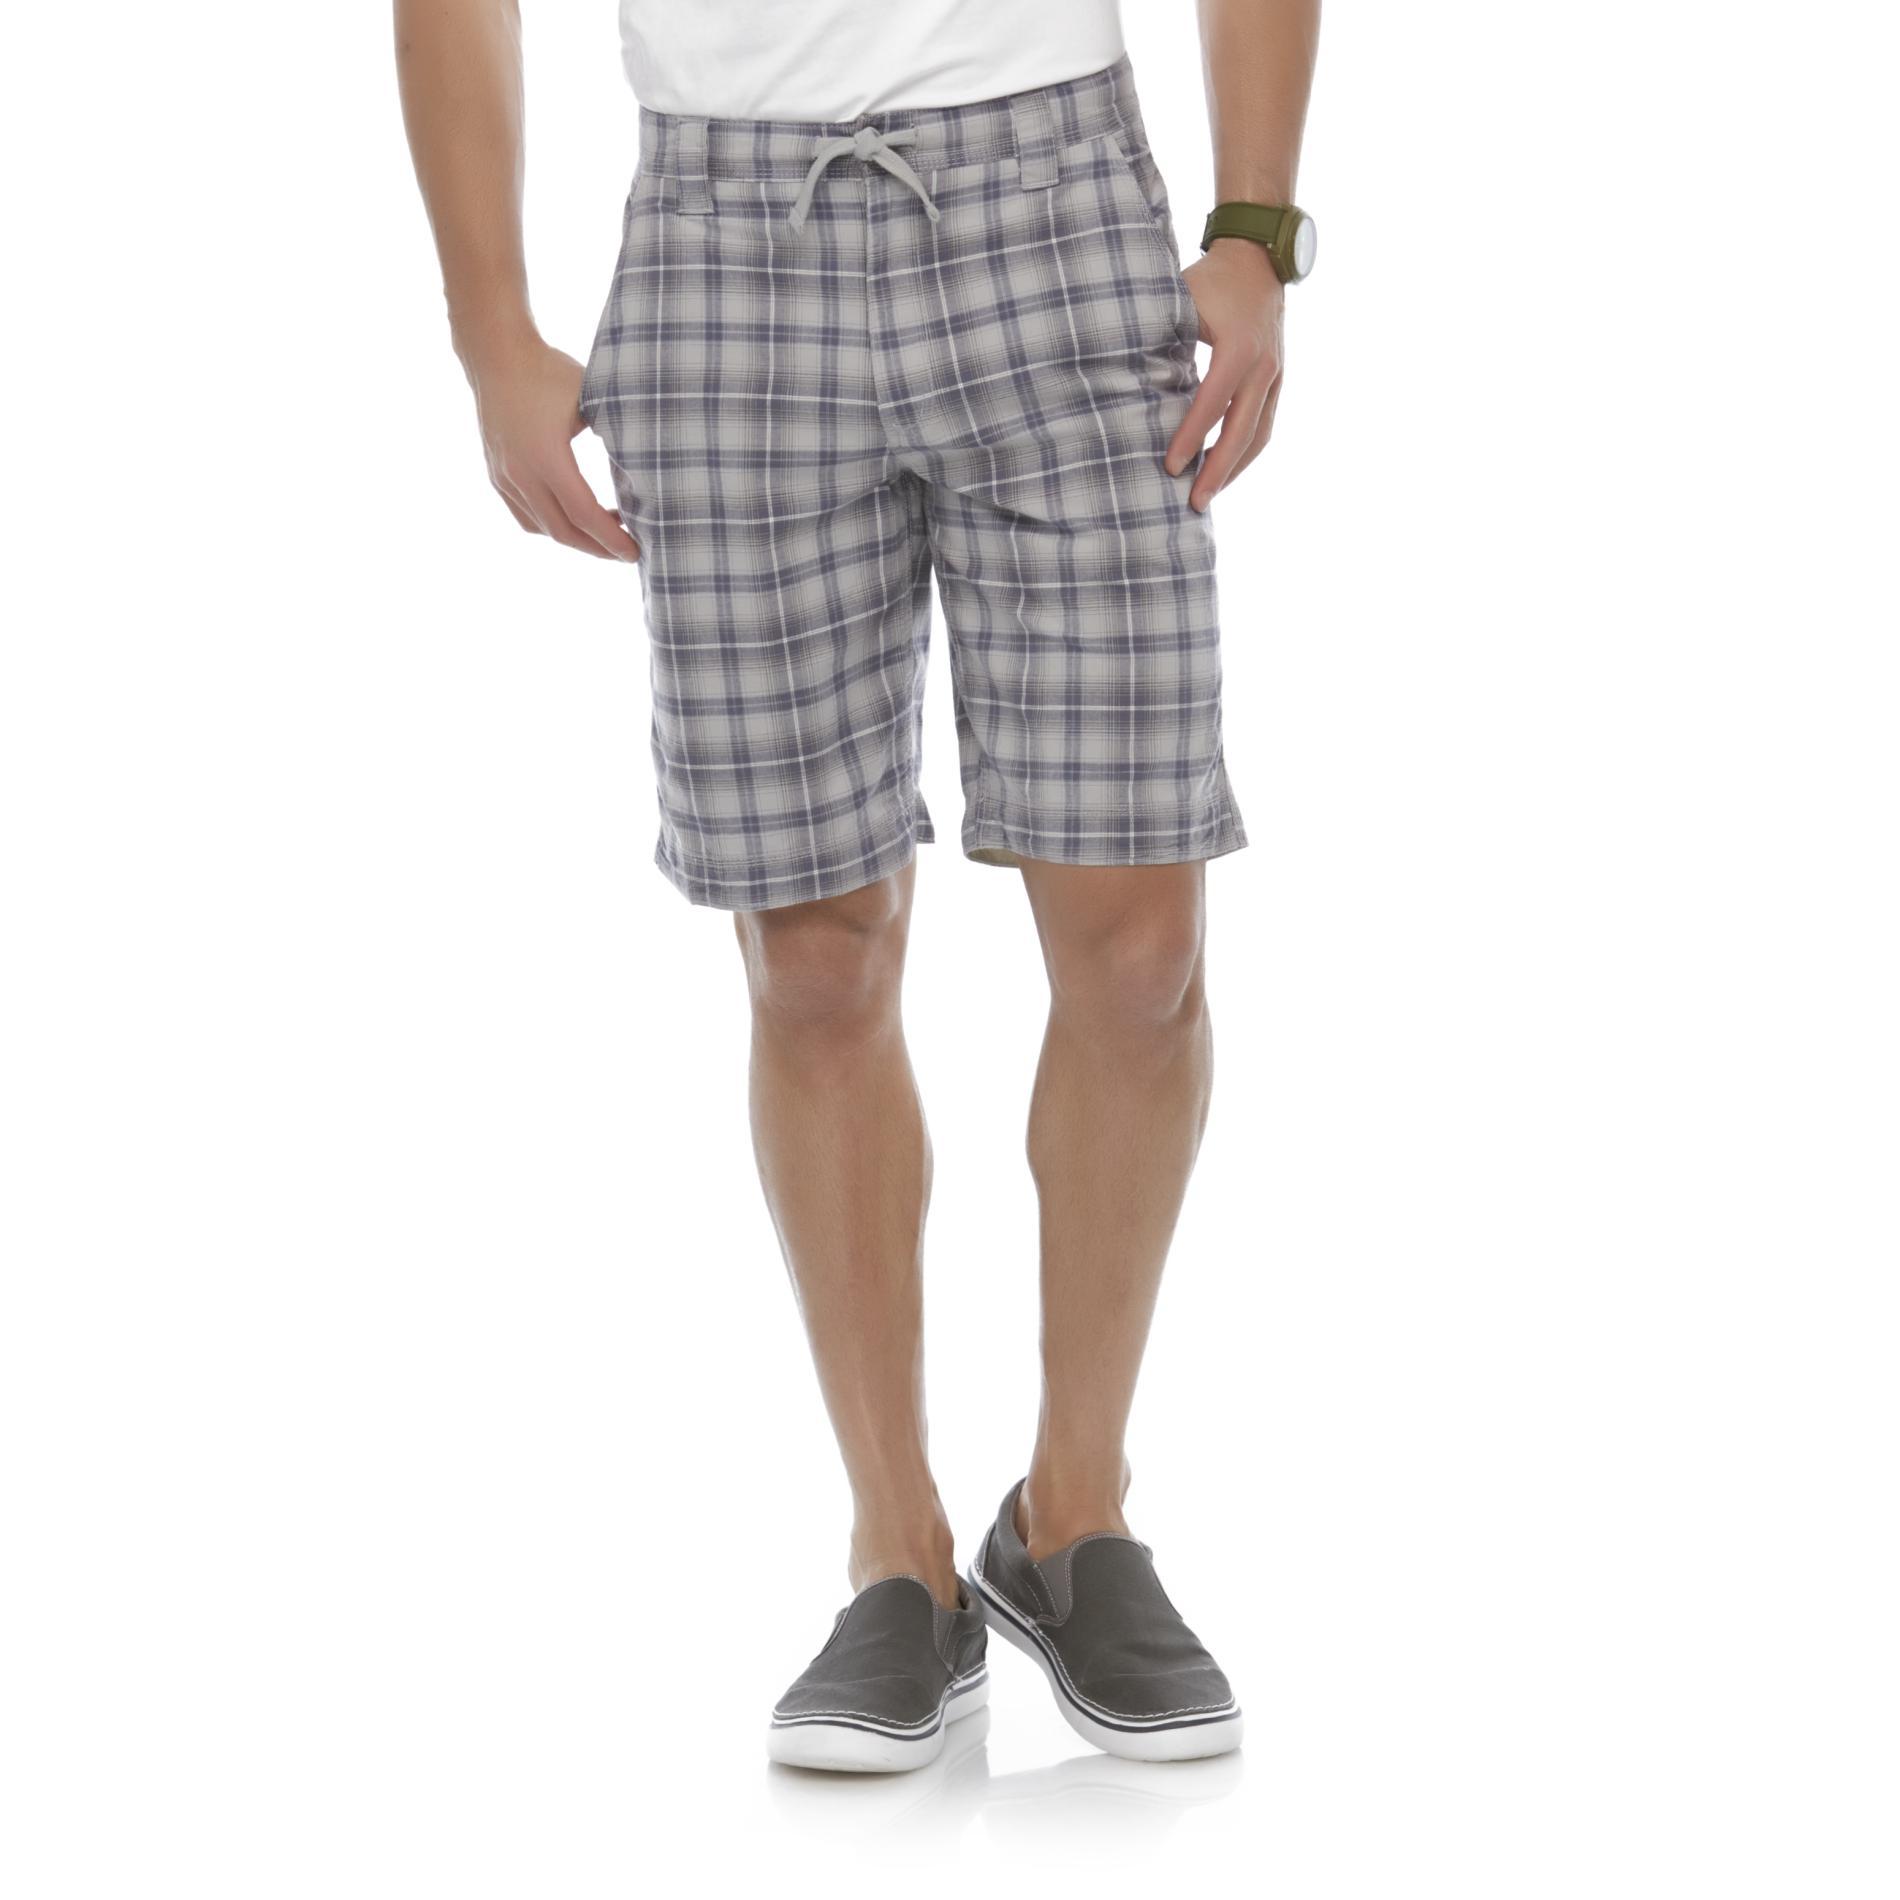 Men's Flat-Front Walking Shorts - Plaid